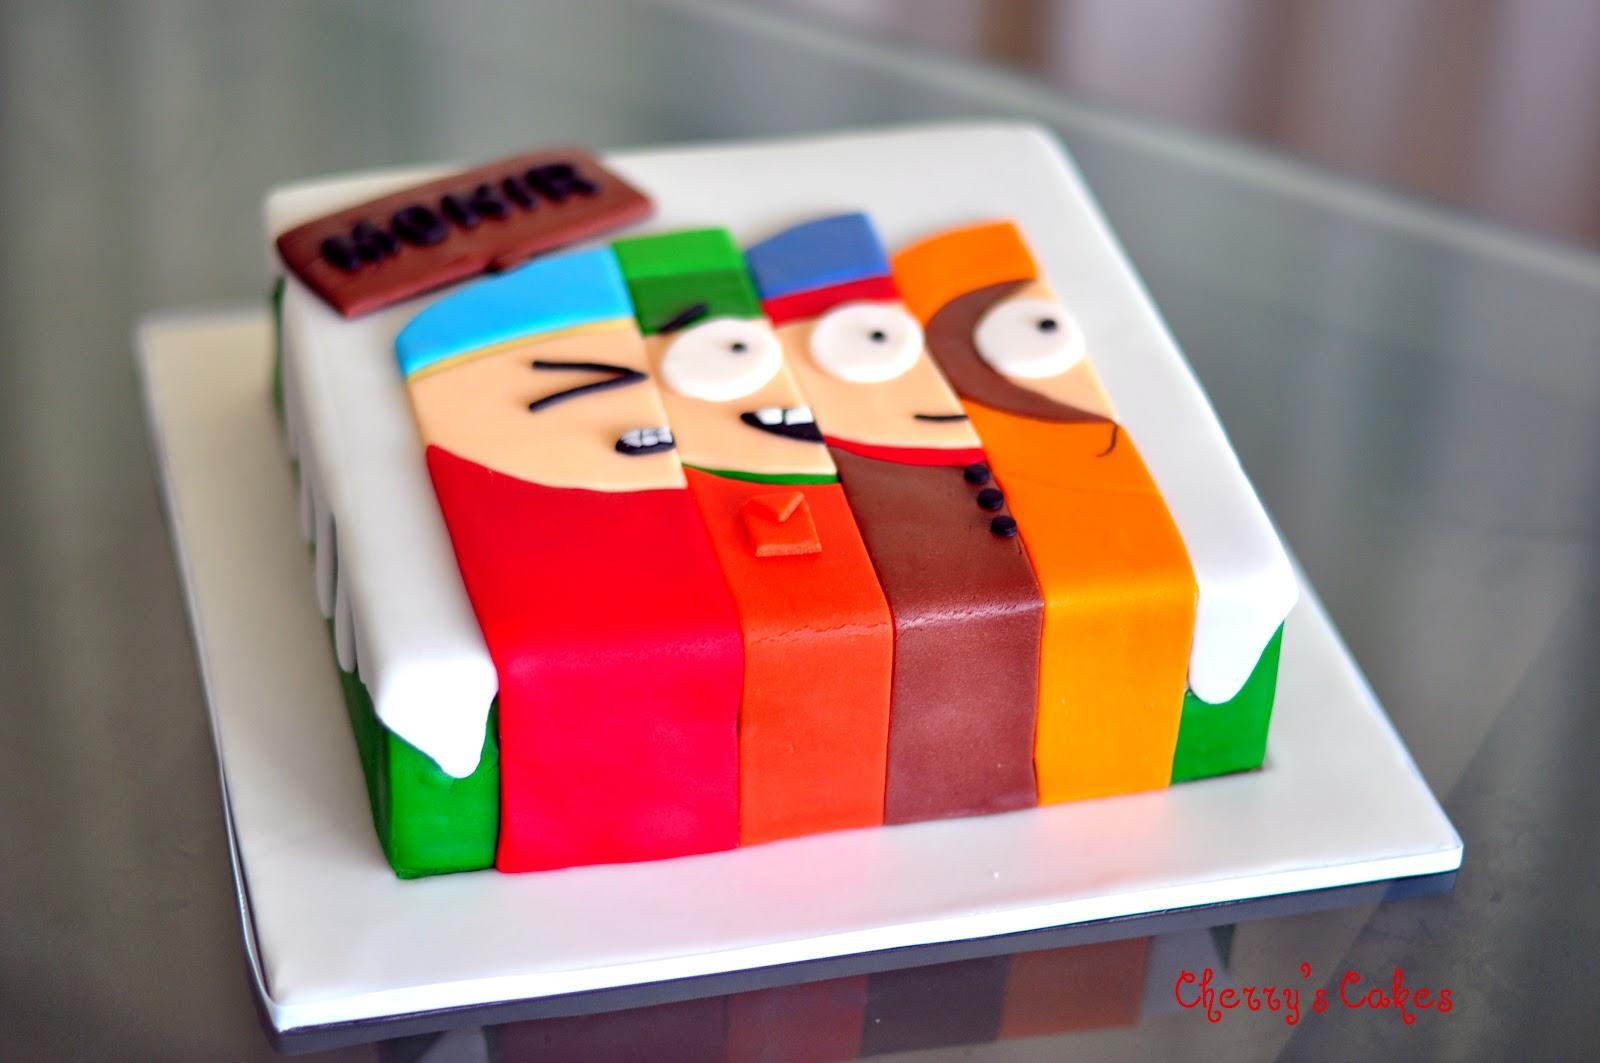 Cherry S Cakes South Park